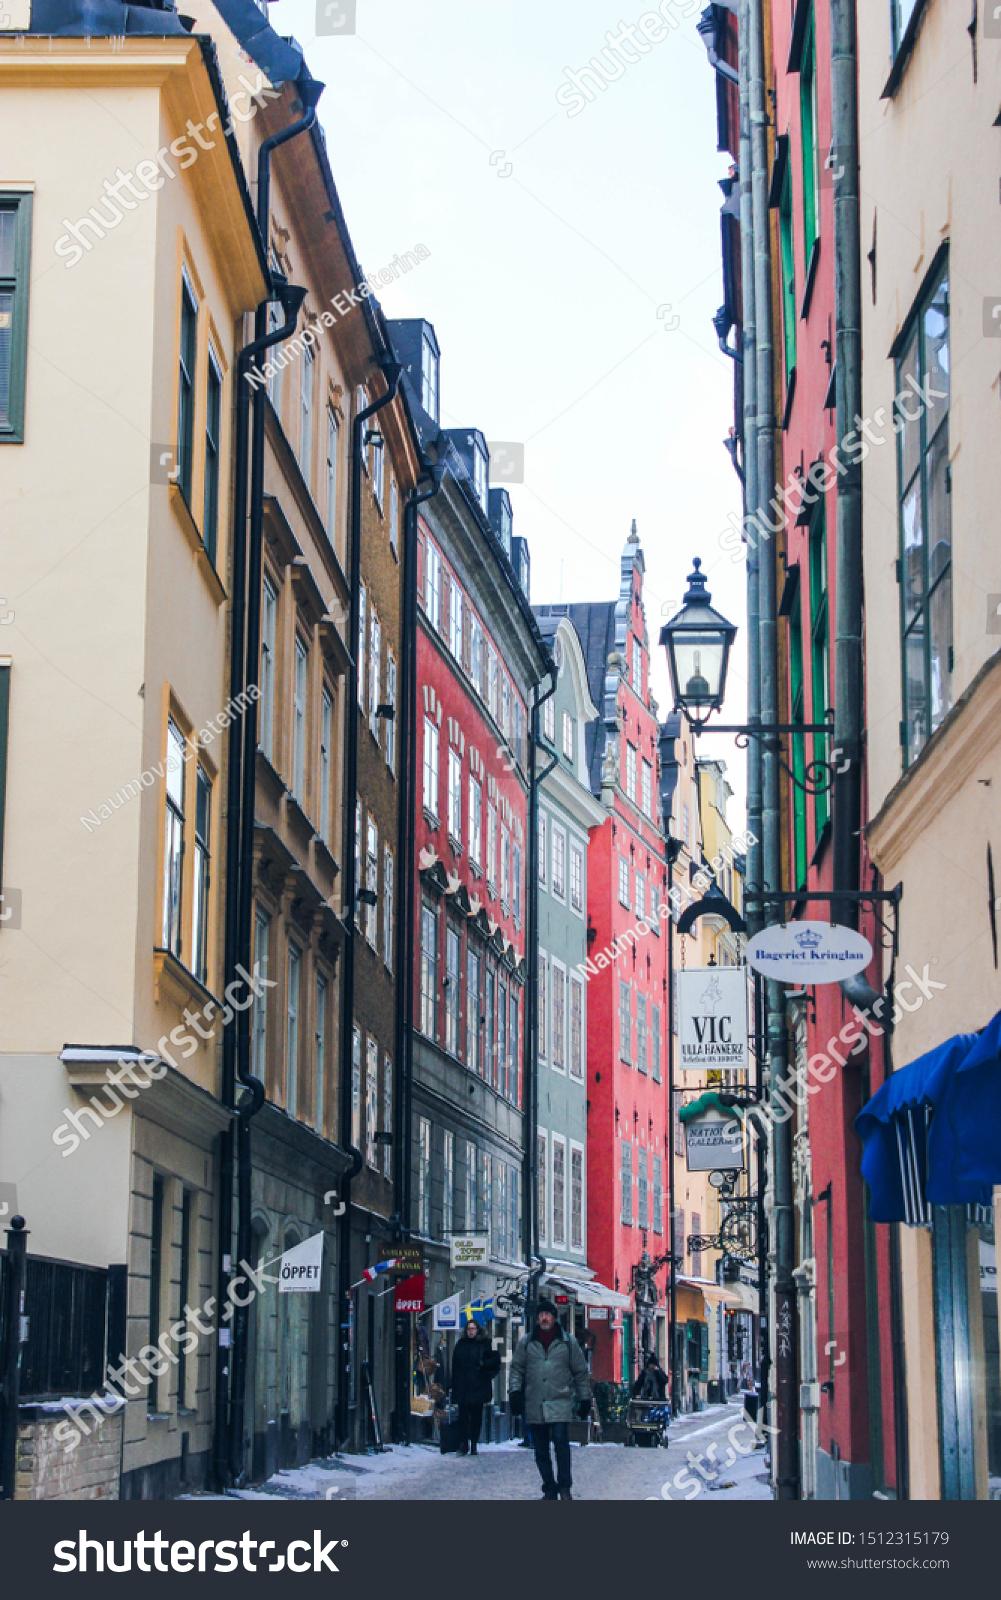 Stockholm Sweden November 16 2018 Cozy Stock Photo Edit Now 1512315179